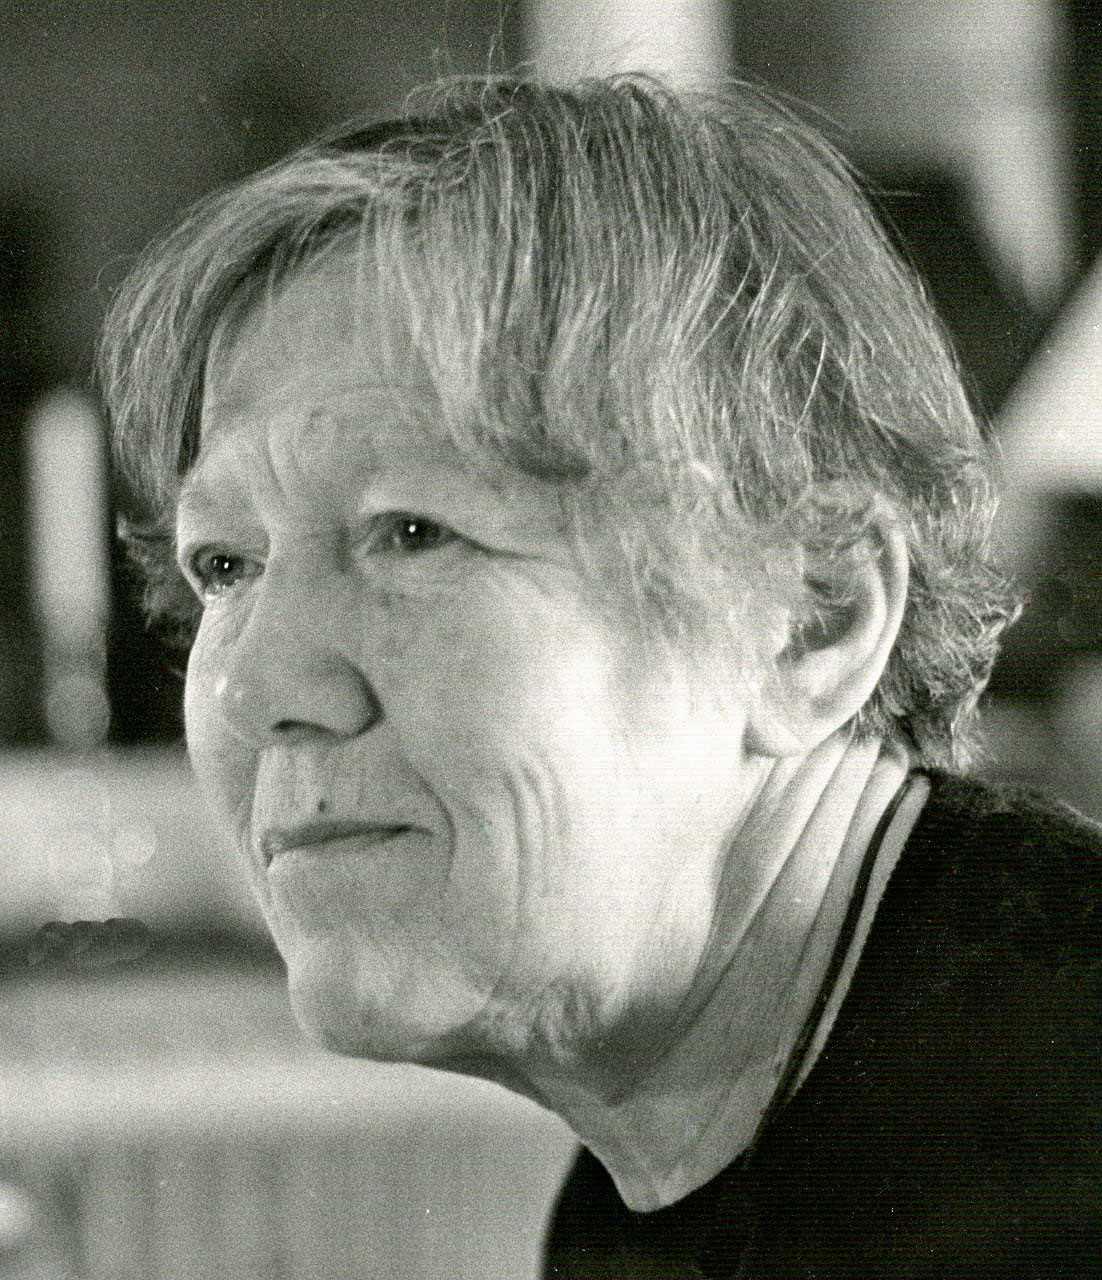 Marianne Lindstén, cirka 1960-tal. Fotograf okänd (bild i privat ägo)